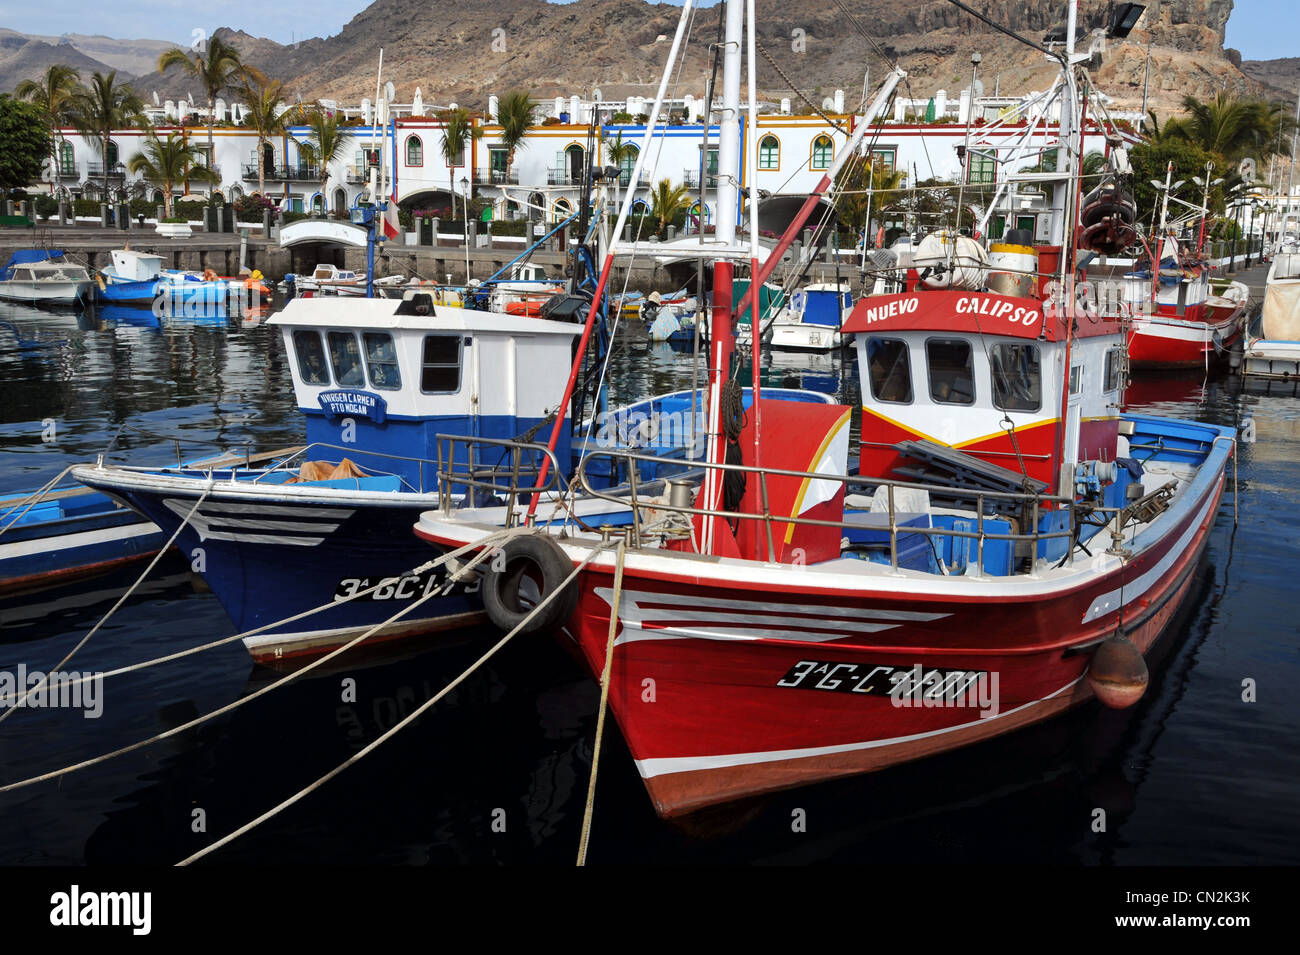 Puerto de Mogán, Puerto de Mogan, Gran Canaria, Kanarische Inseln Stockbild